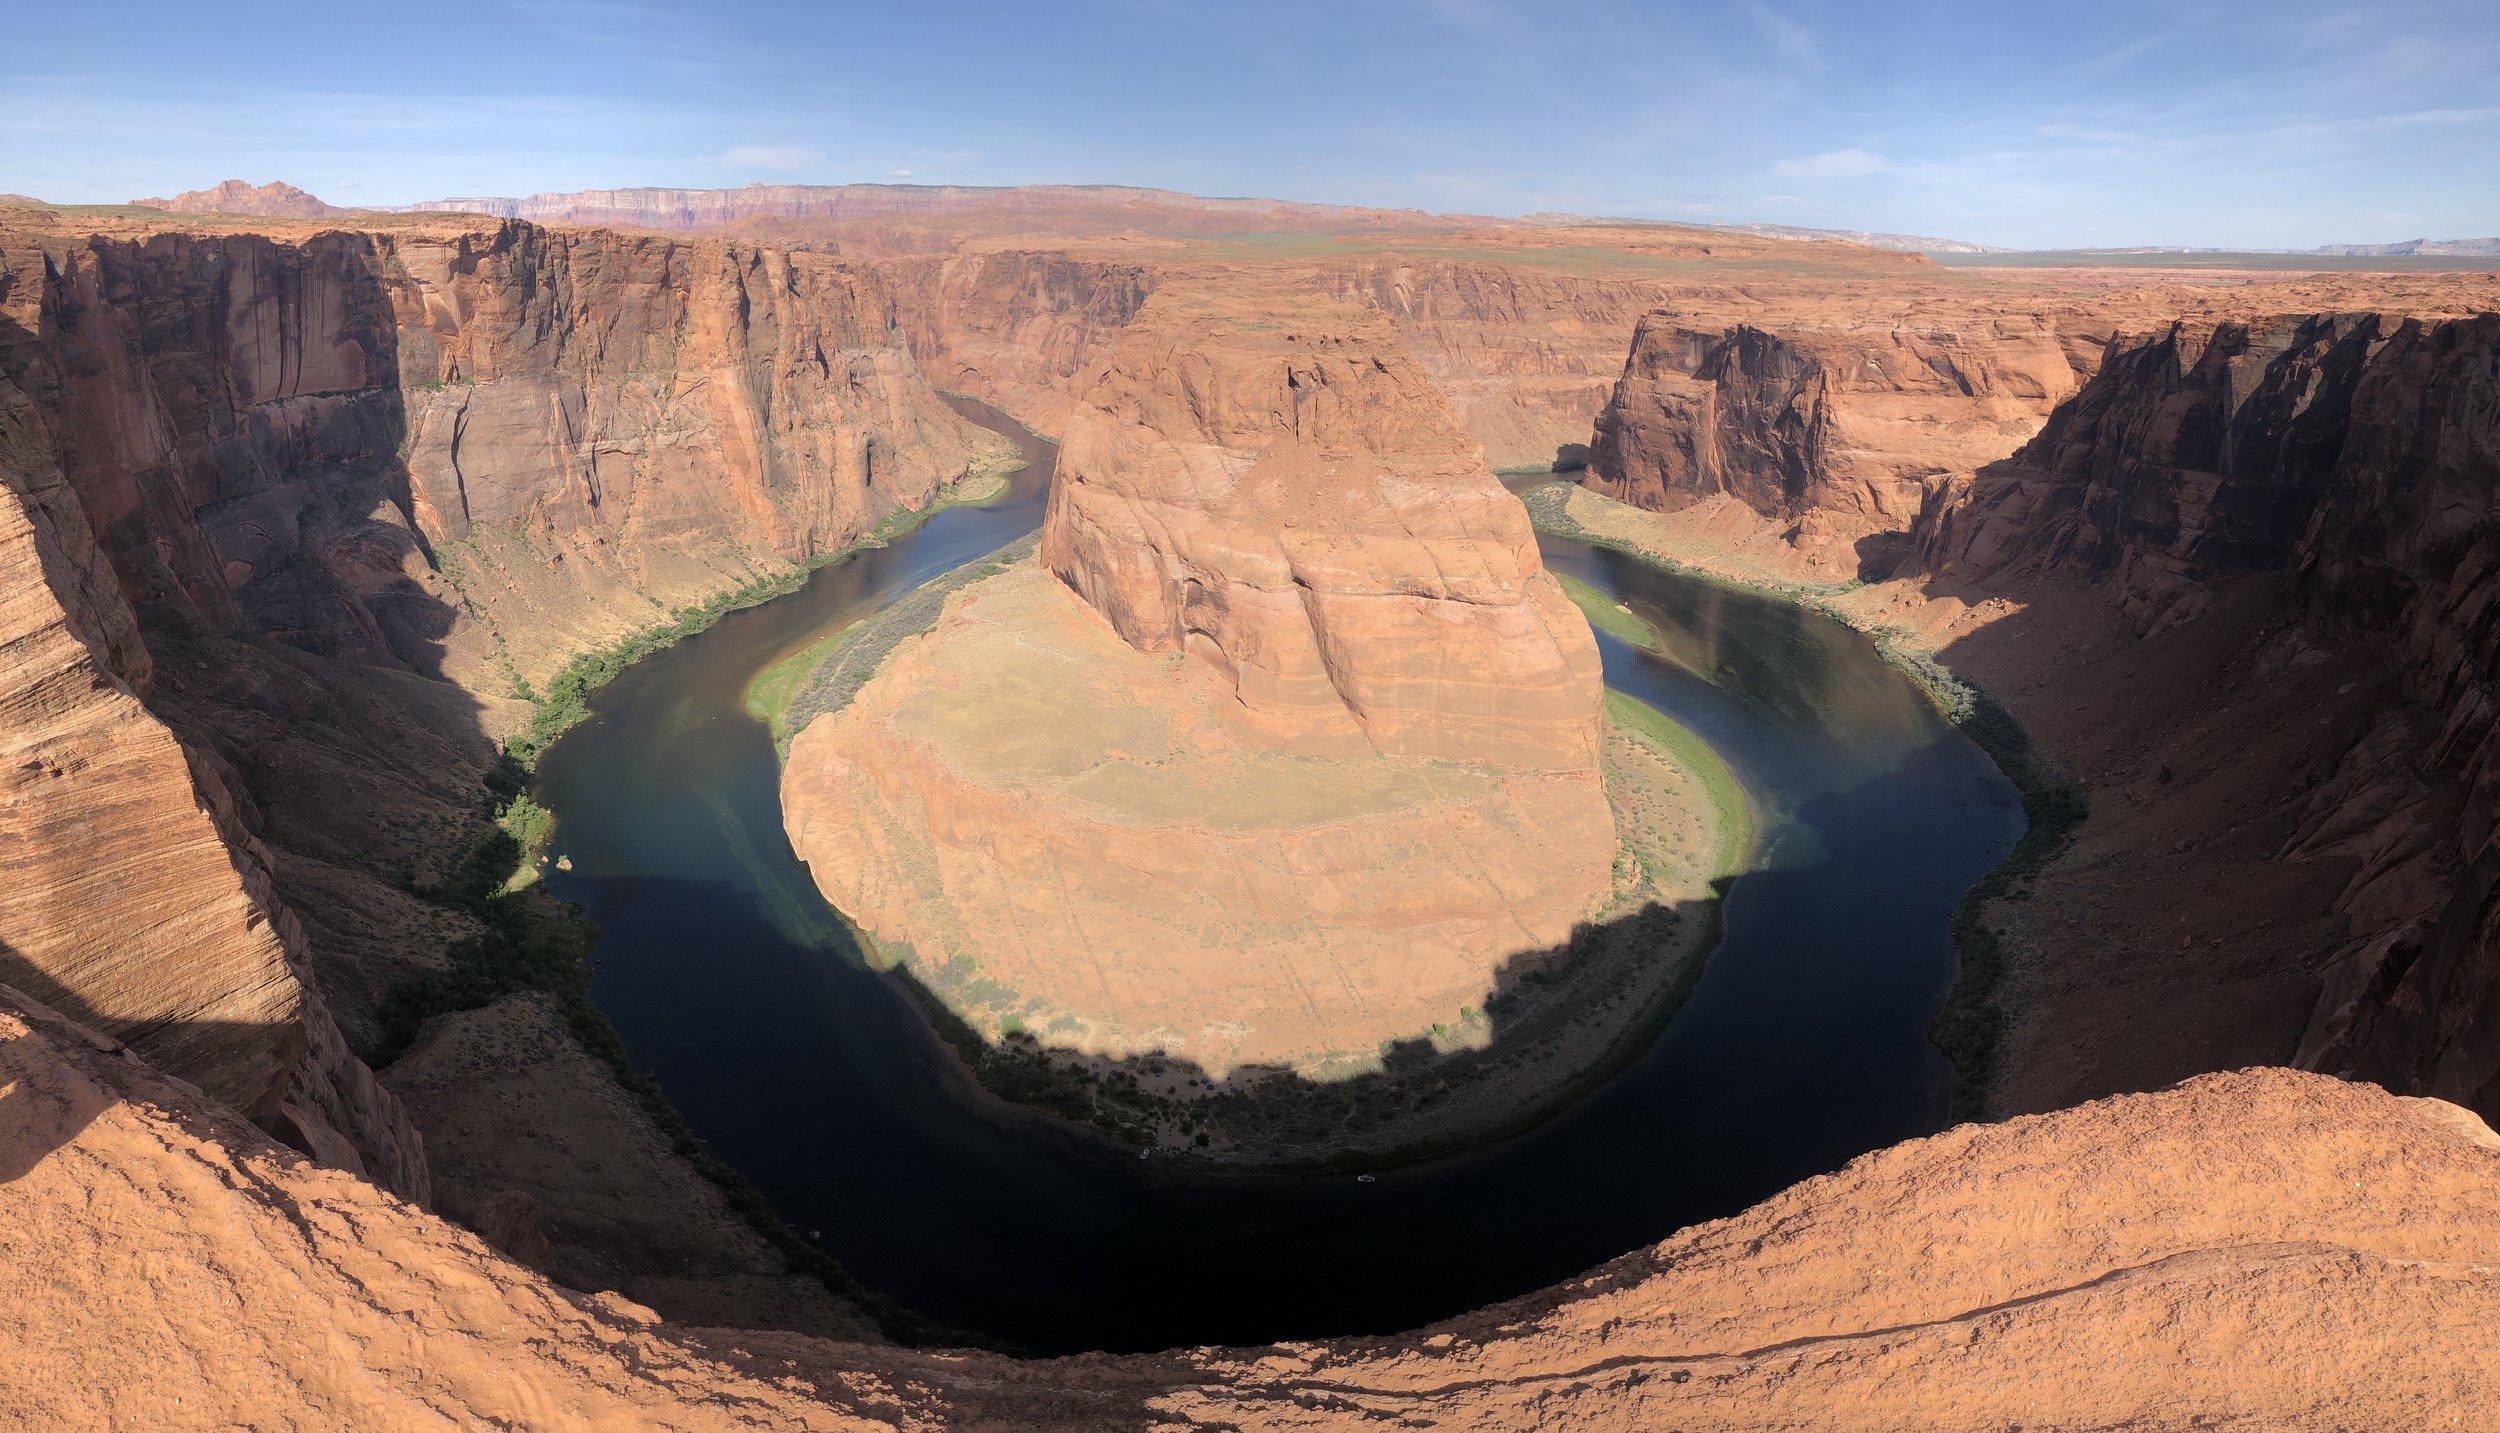 horseshoe-bend-utah-hike-out-office-adventure